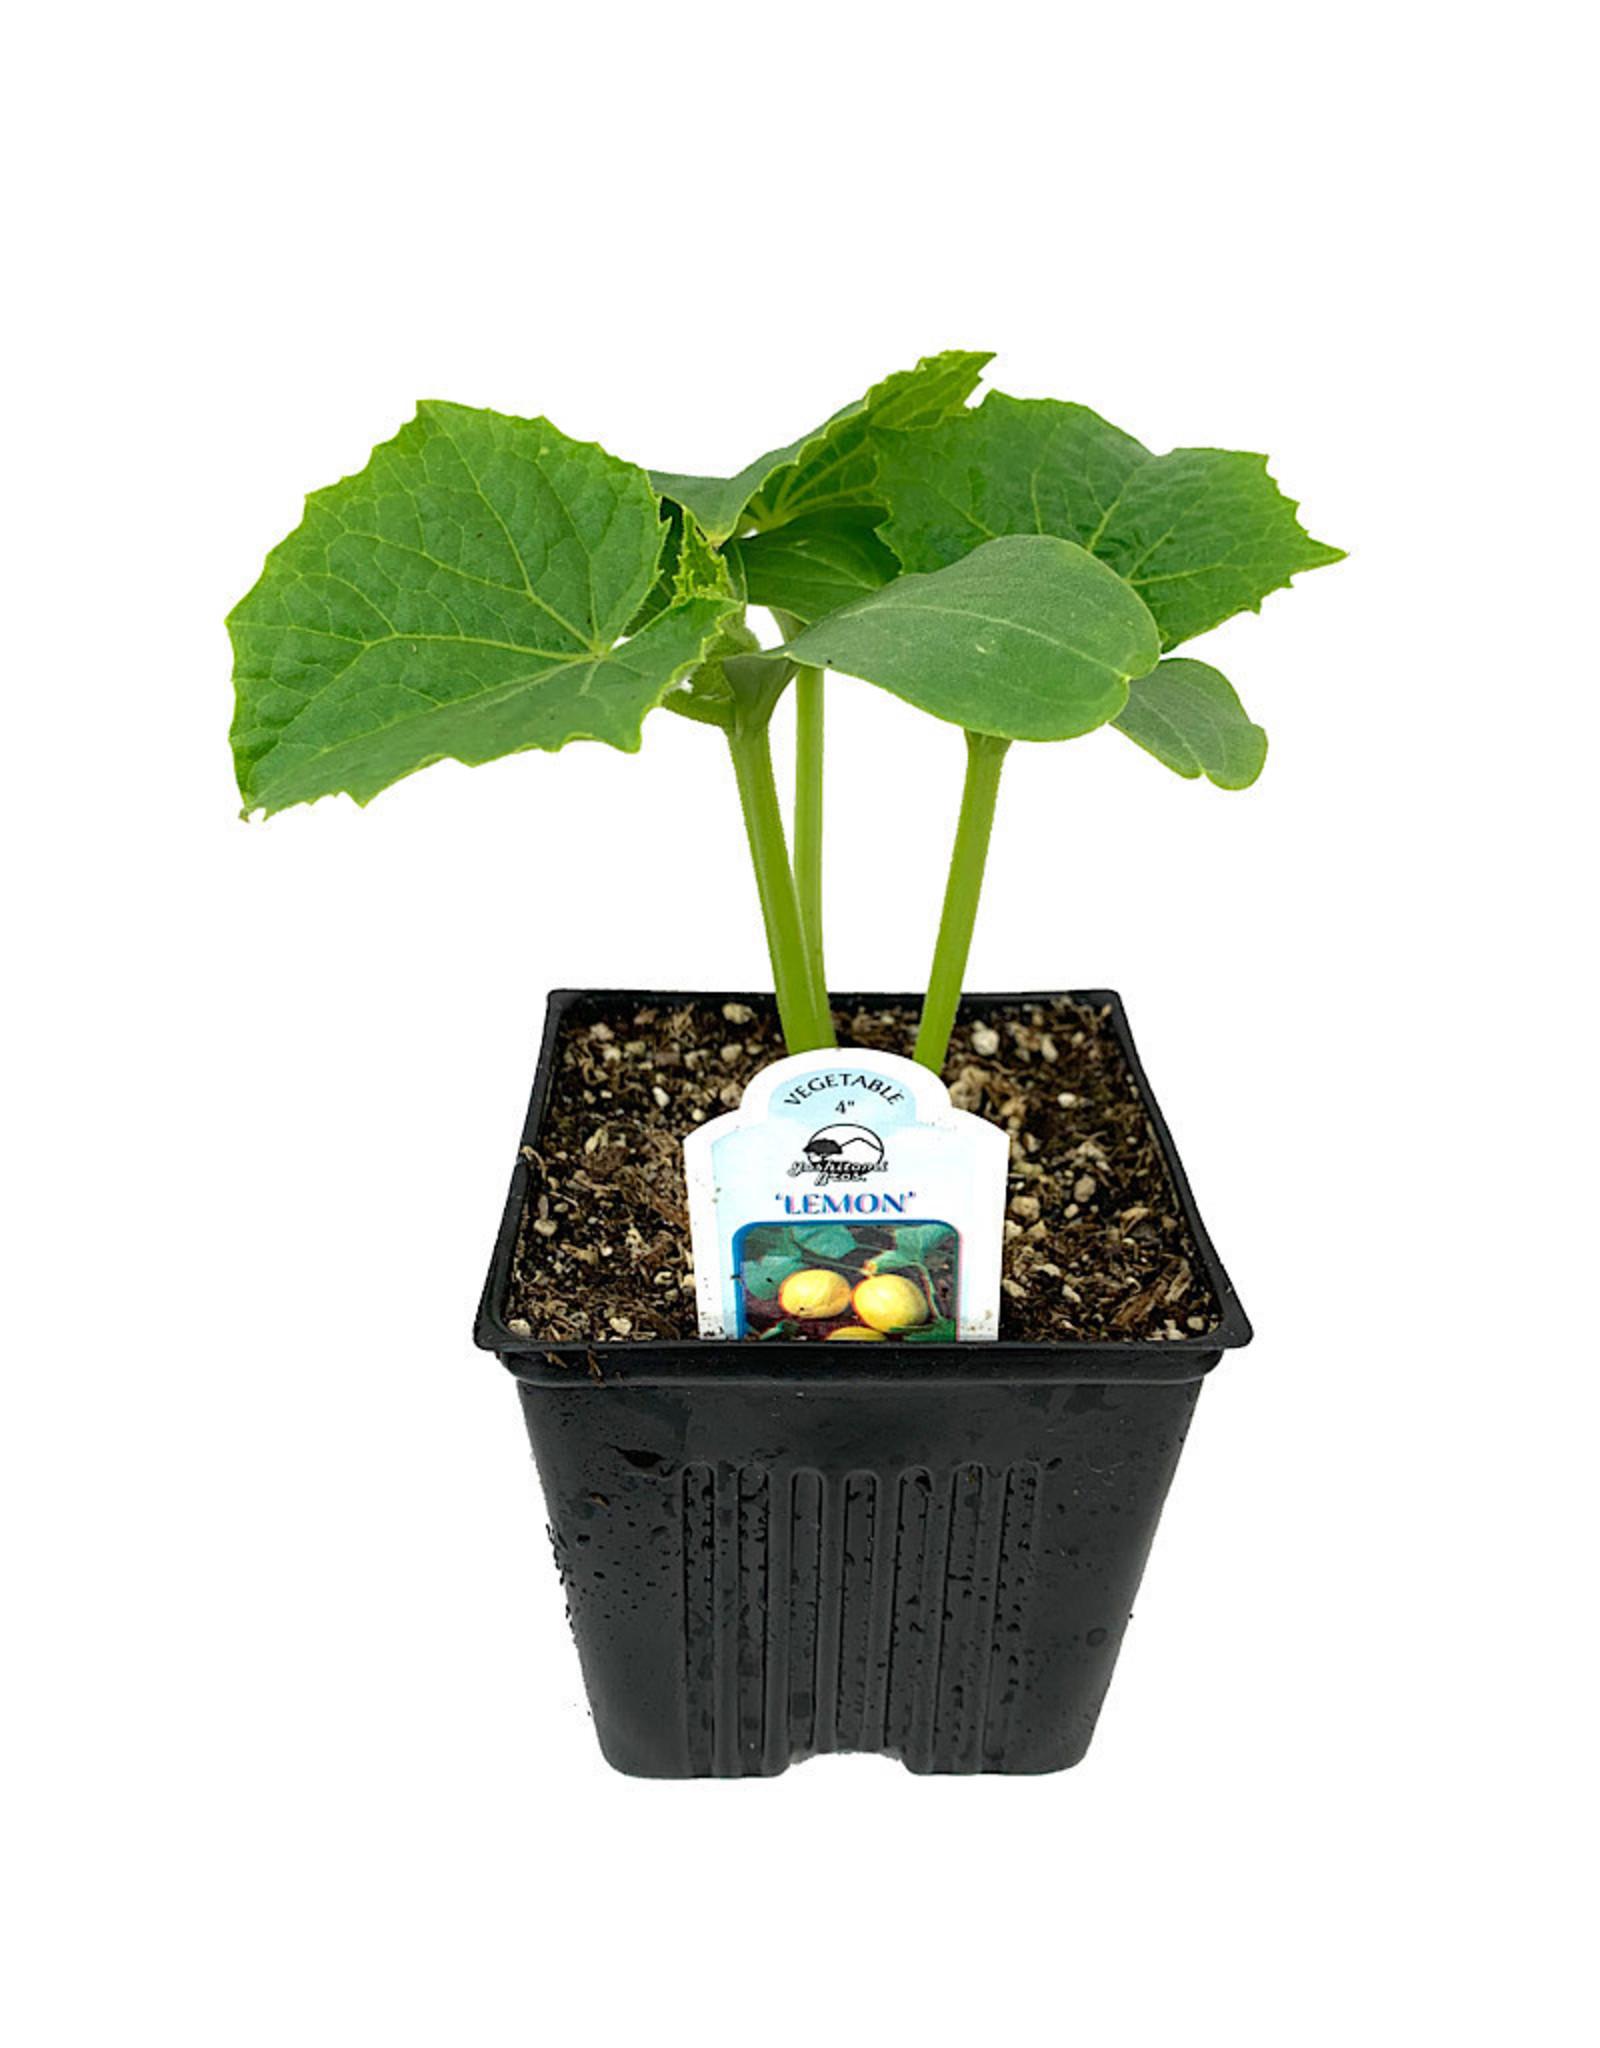 Cucumber 'Lemon' 4 Inch